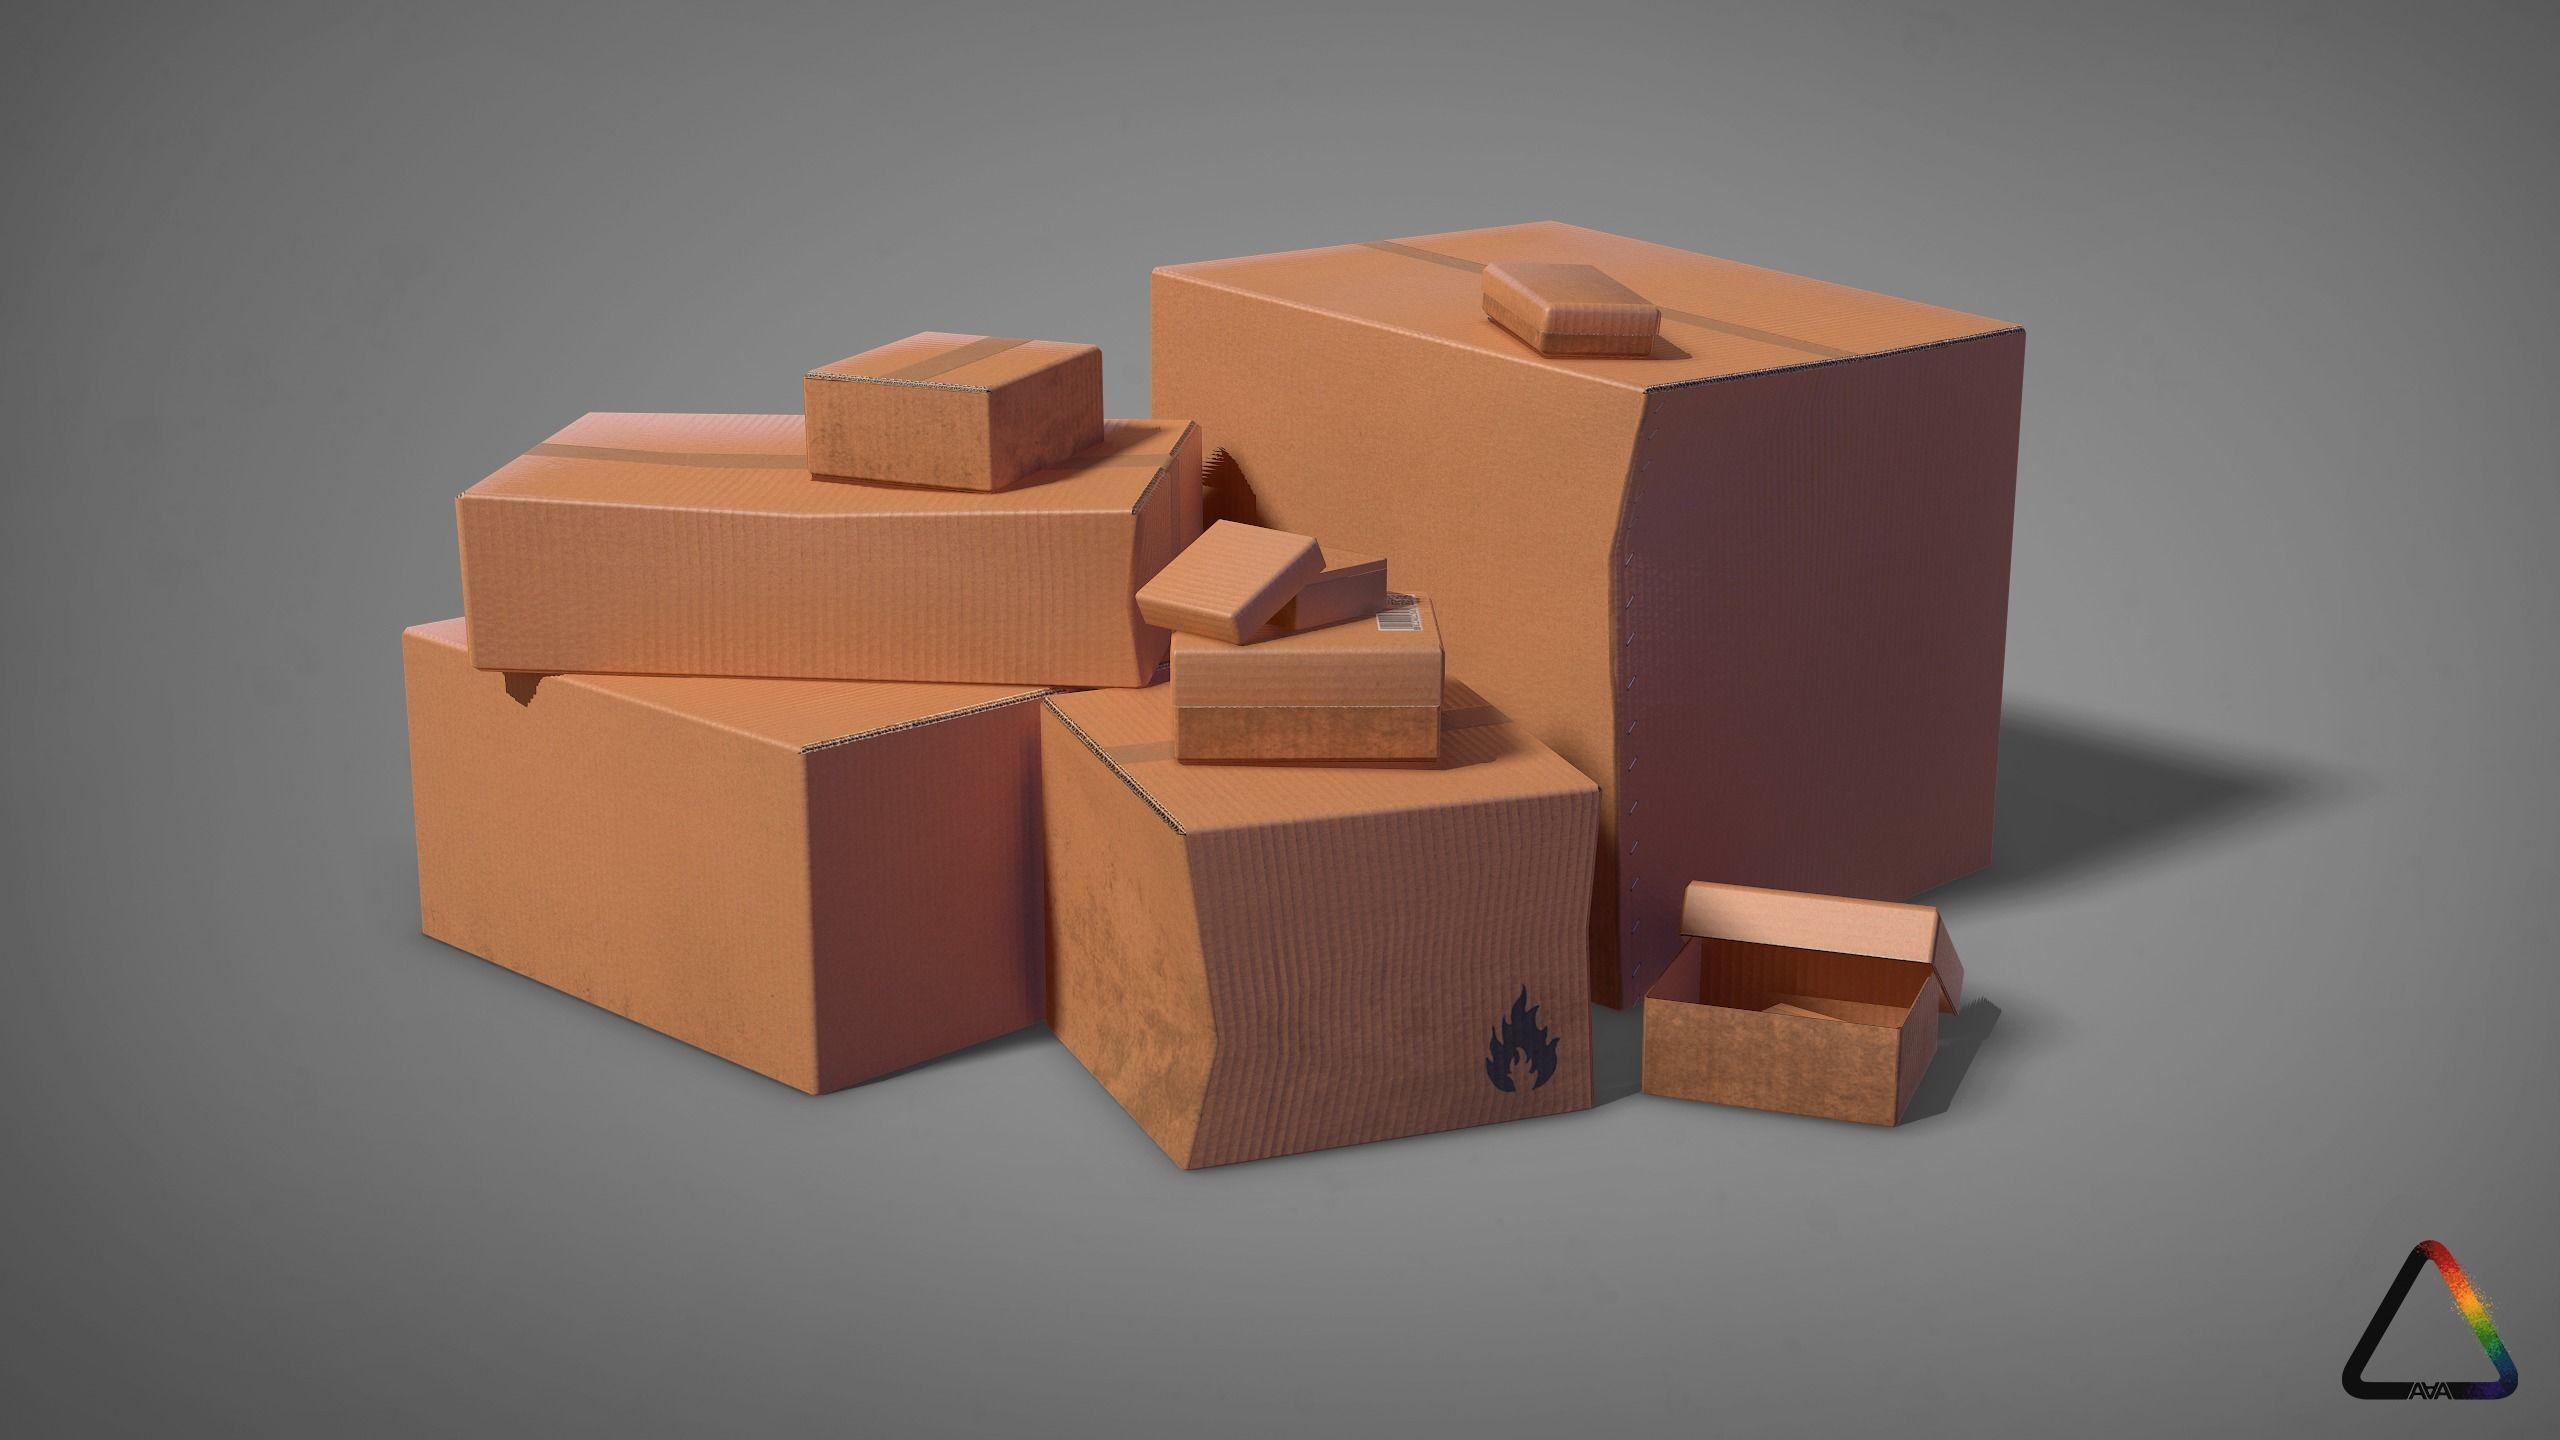 Cardboard Box Pack